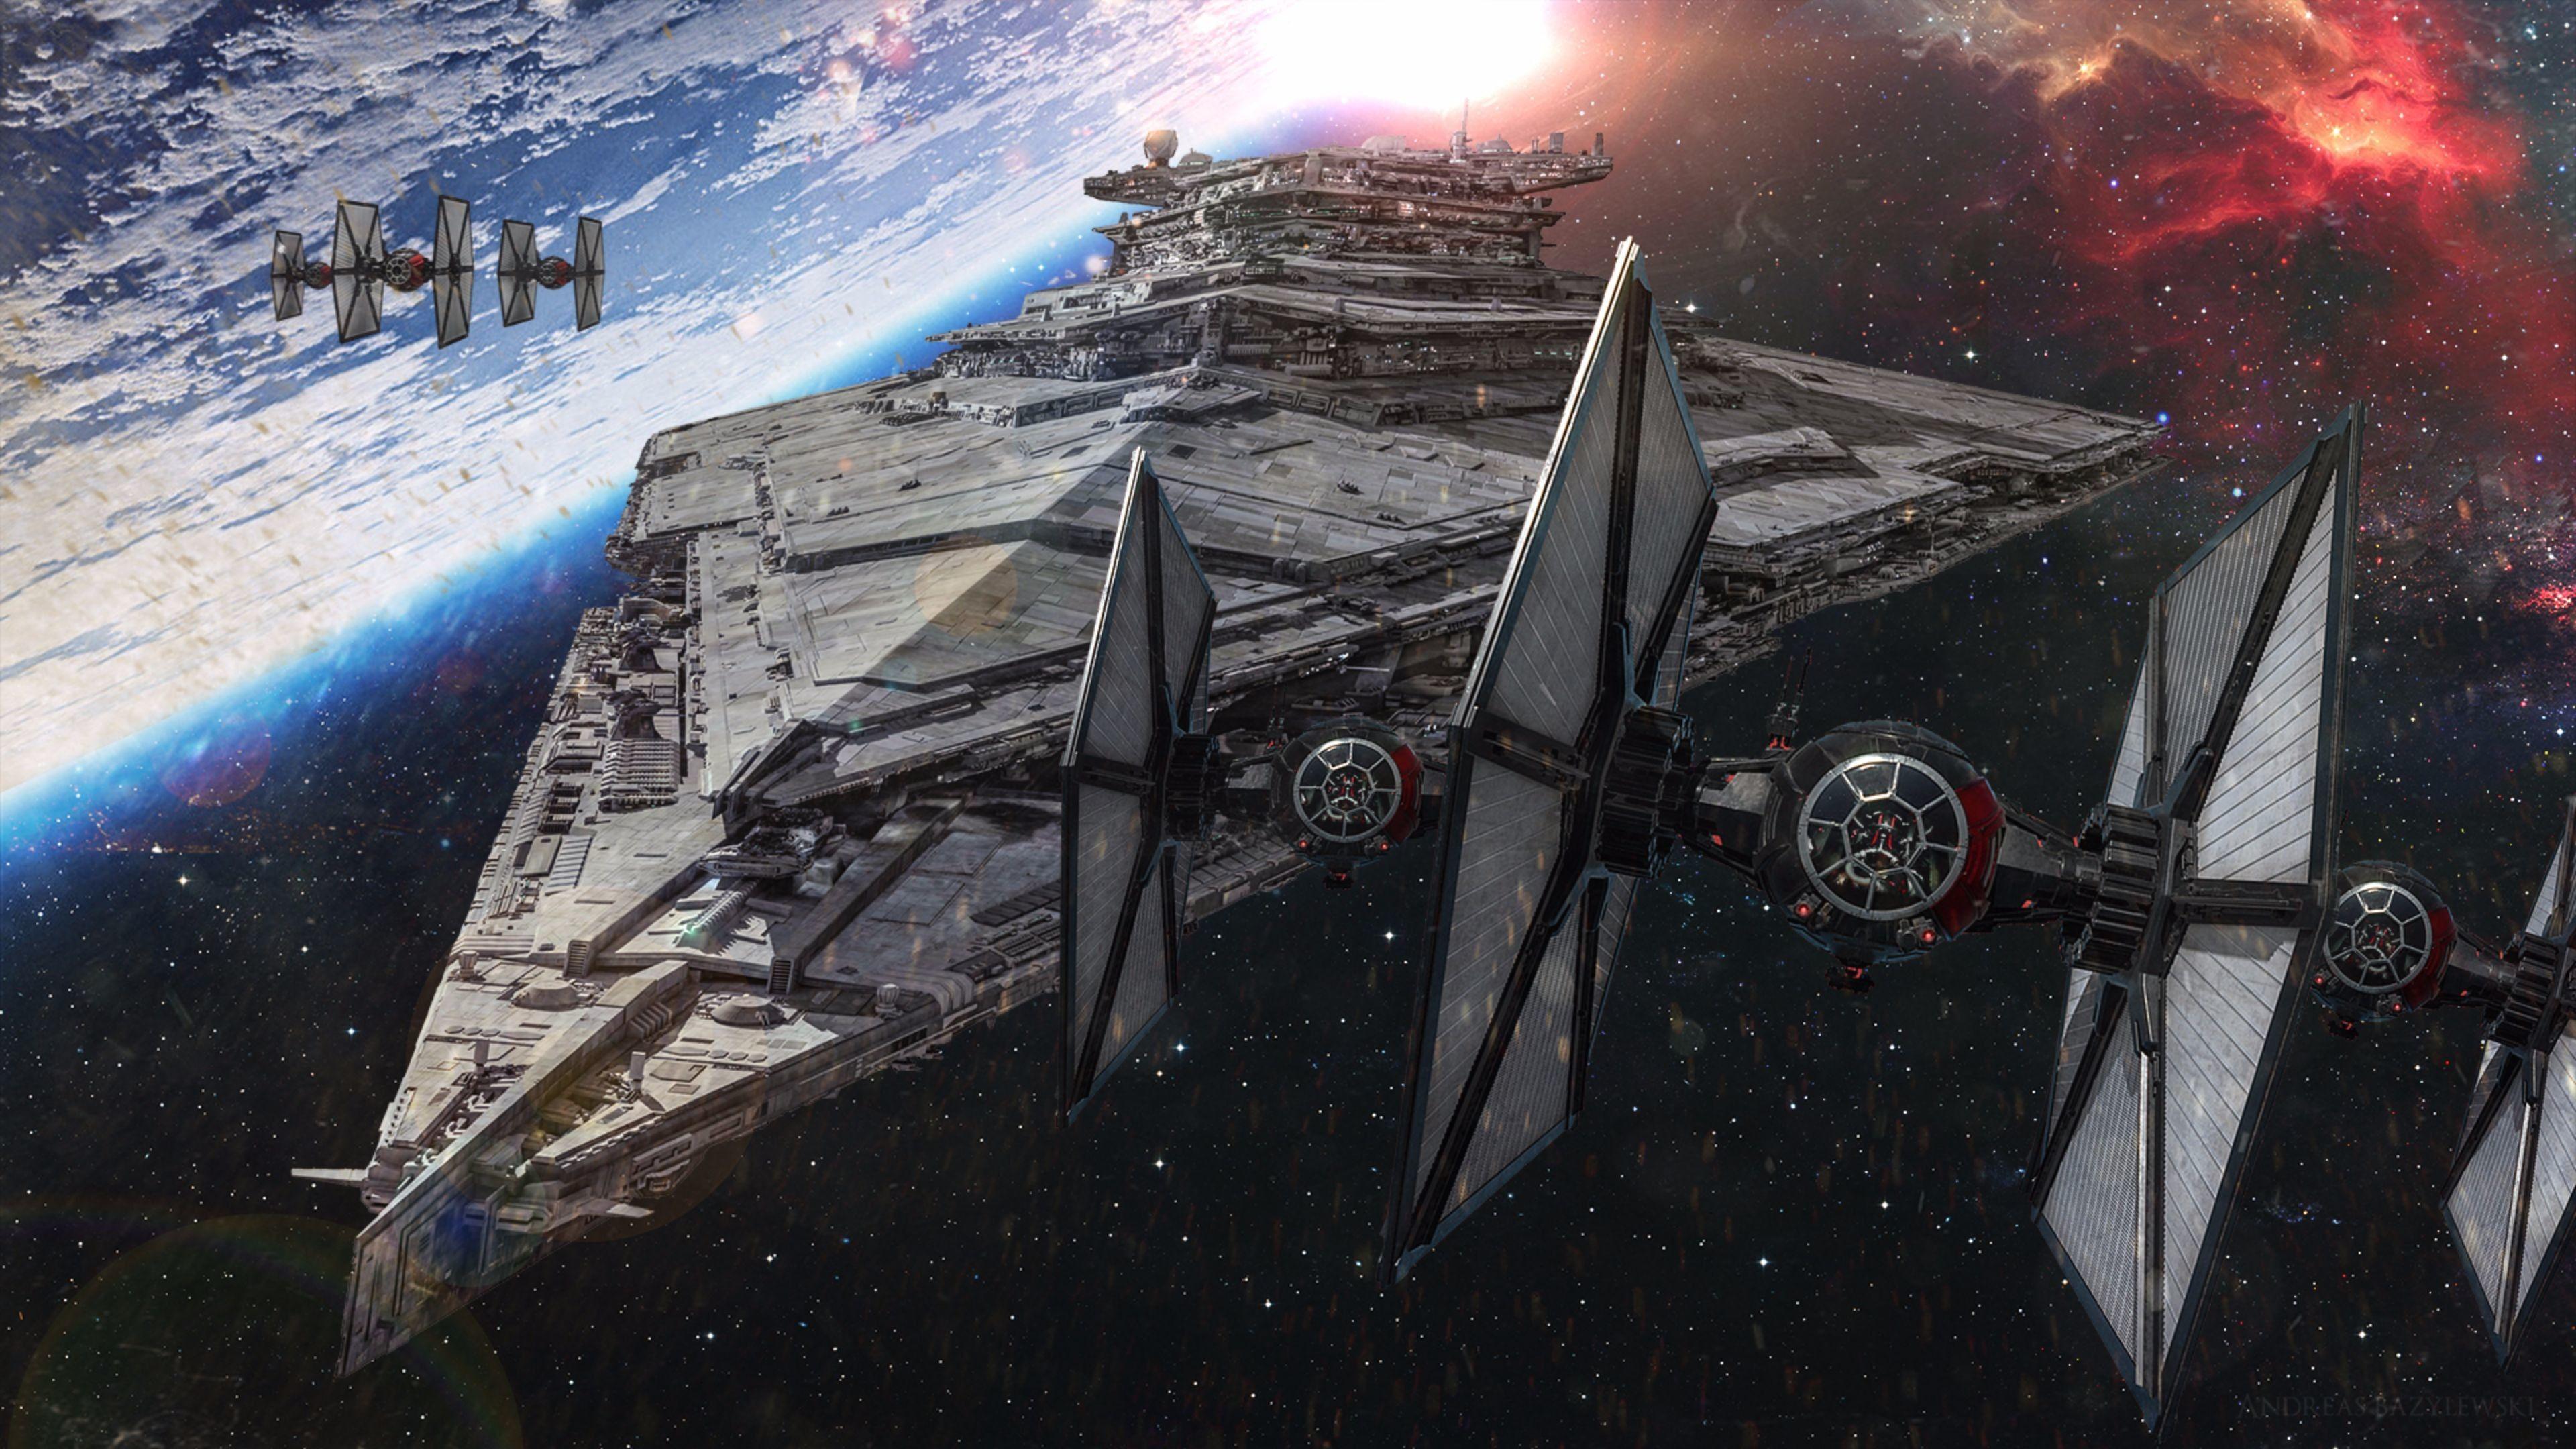 Star Wars Wallpaper Imgur